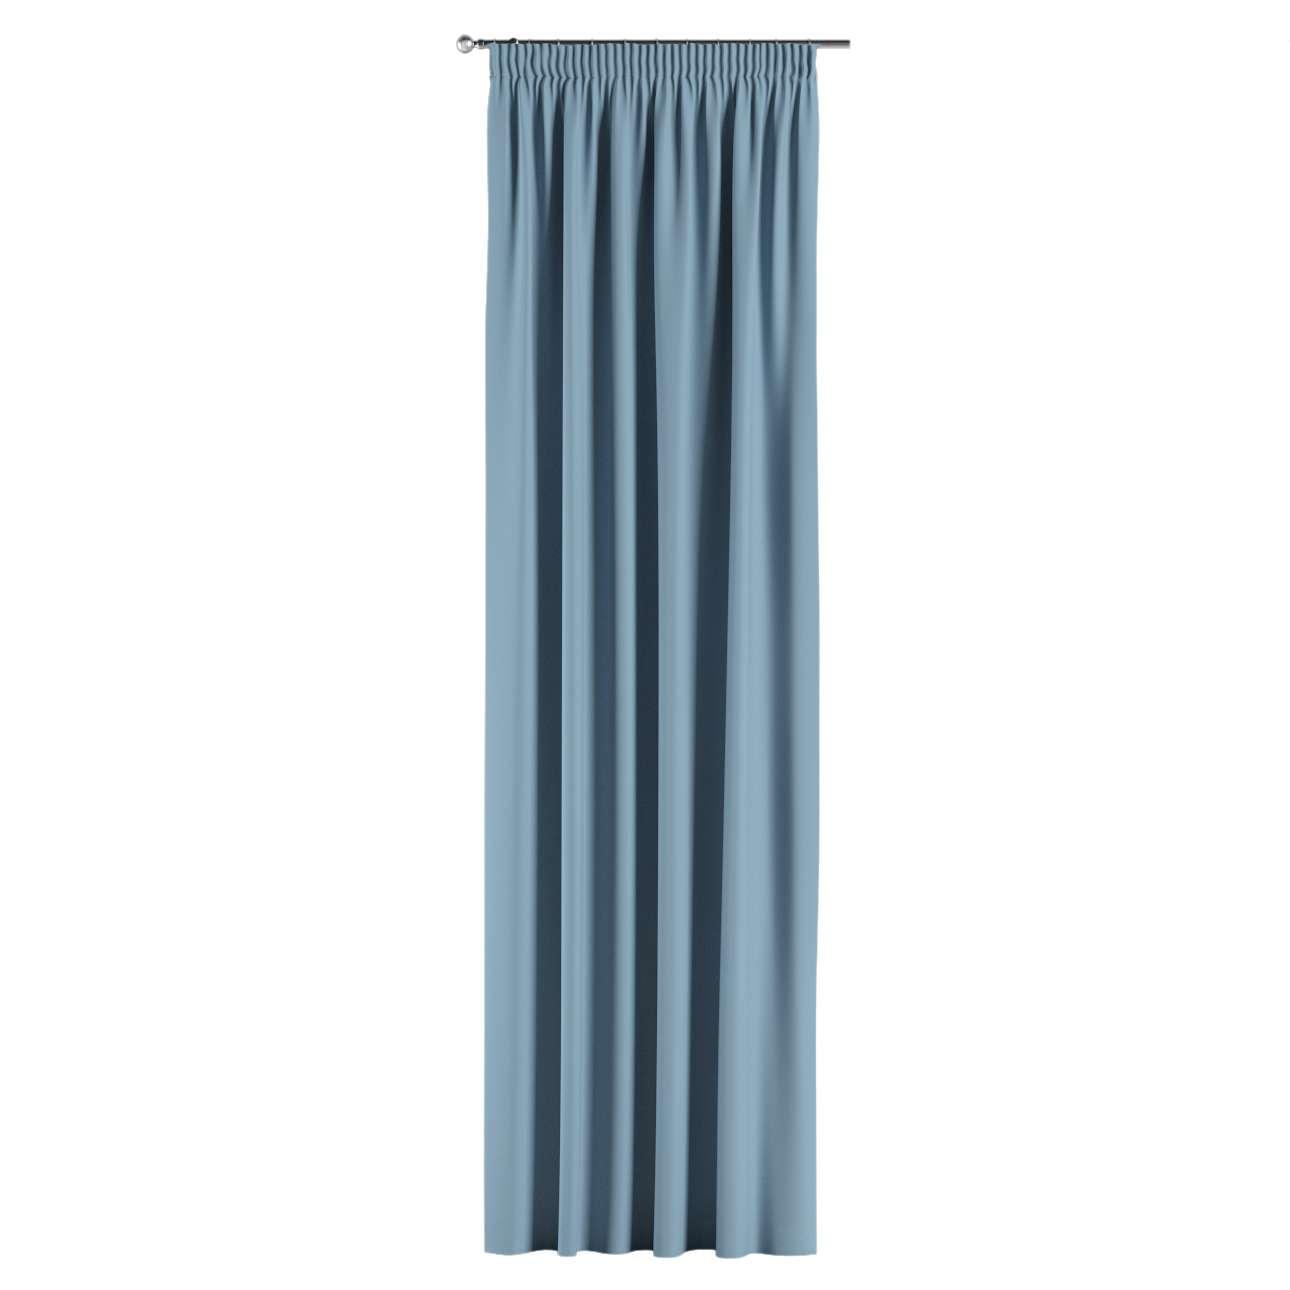 verdunklungsvorhang mit kr uselband blau dekoria. Black Bedroom Furniture Sets. Home Design Ideas